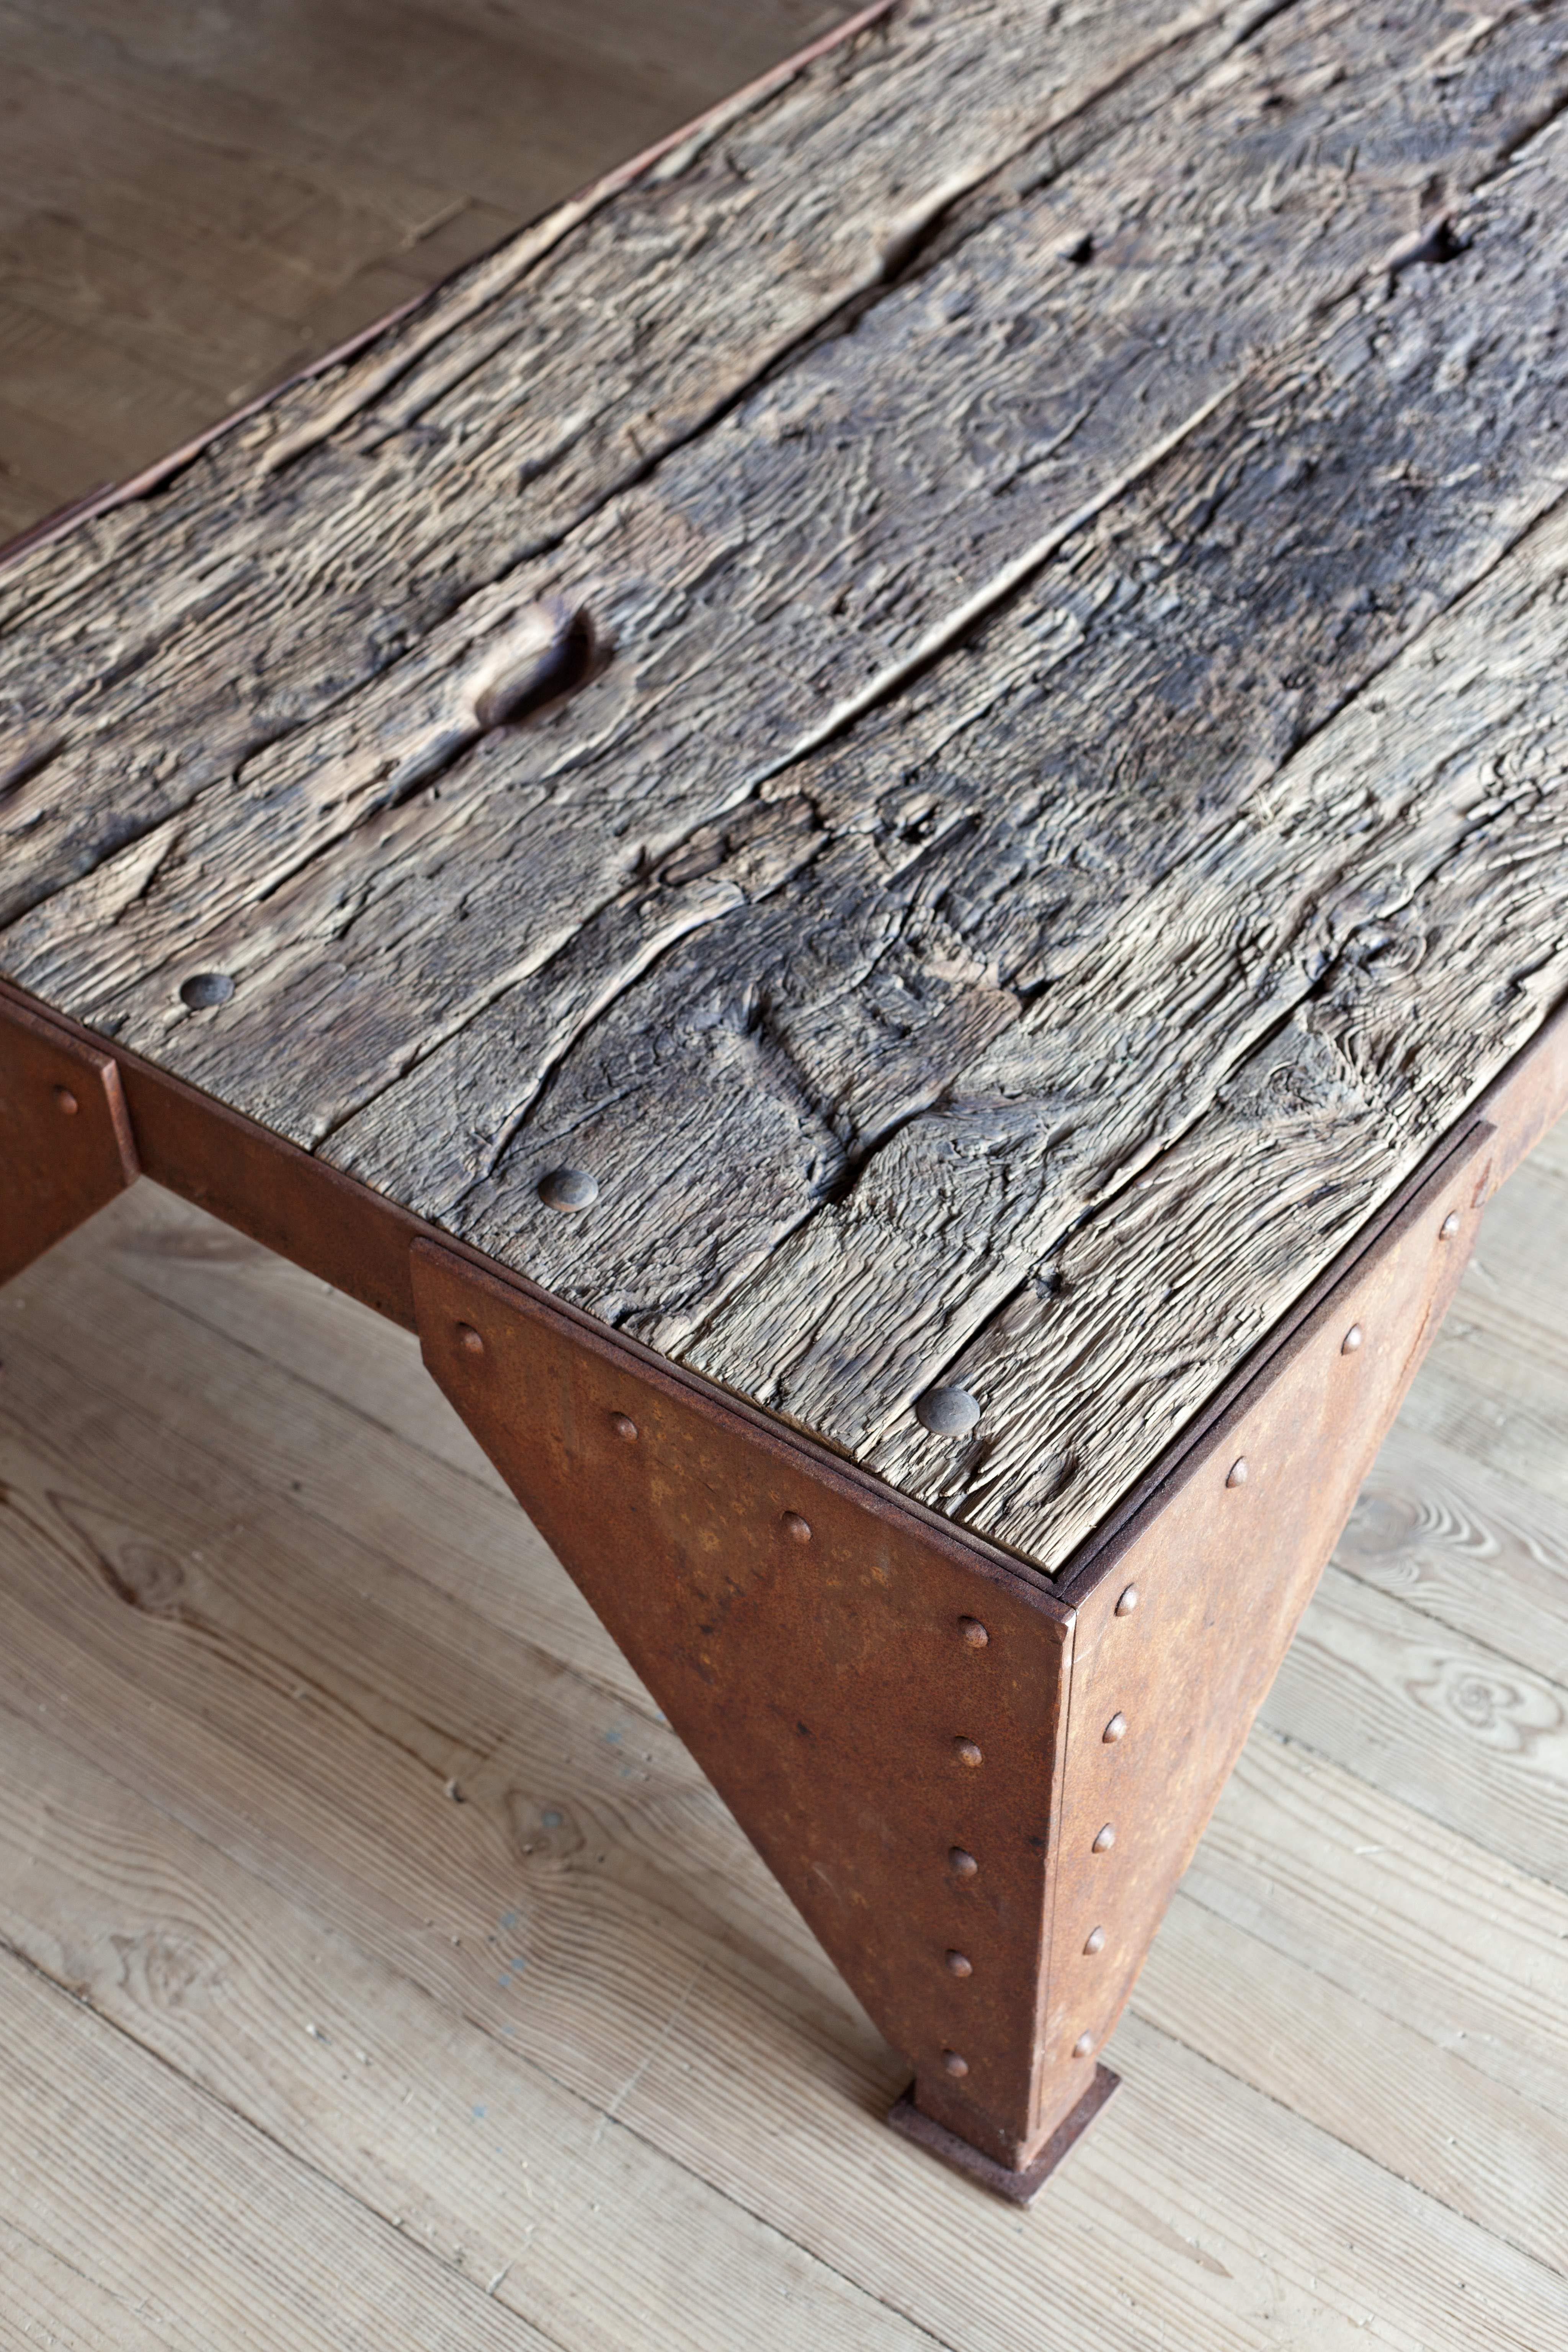 Table by #Cousaert | Holz | Pinterest | Carpintería, Bancos y Rusticas